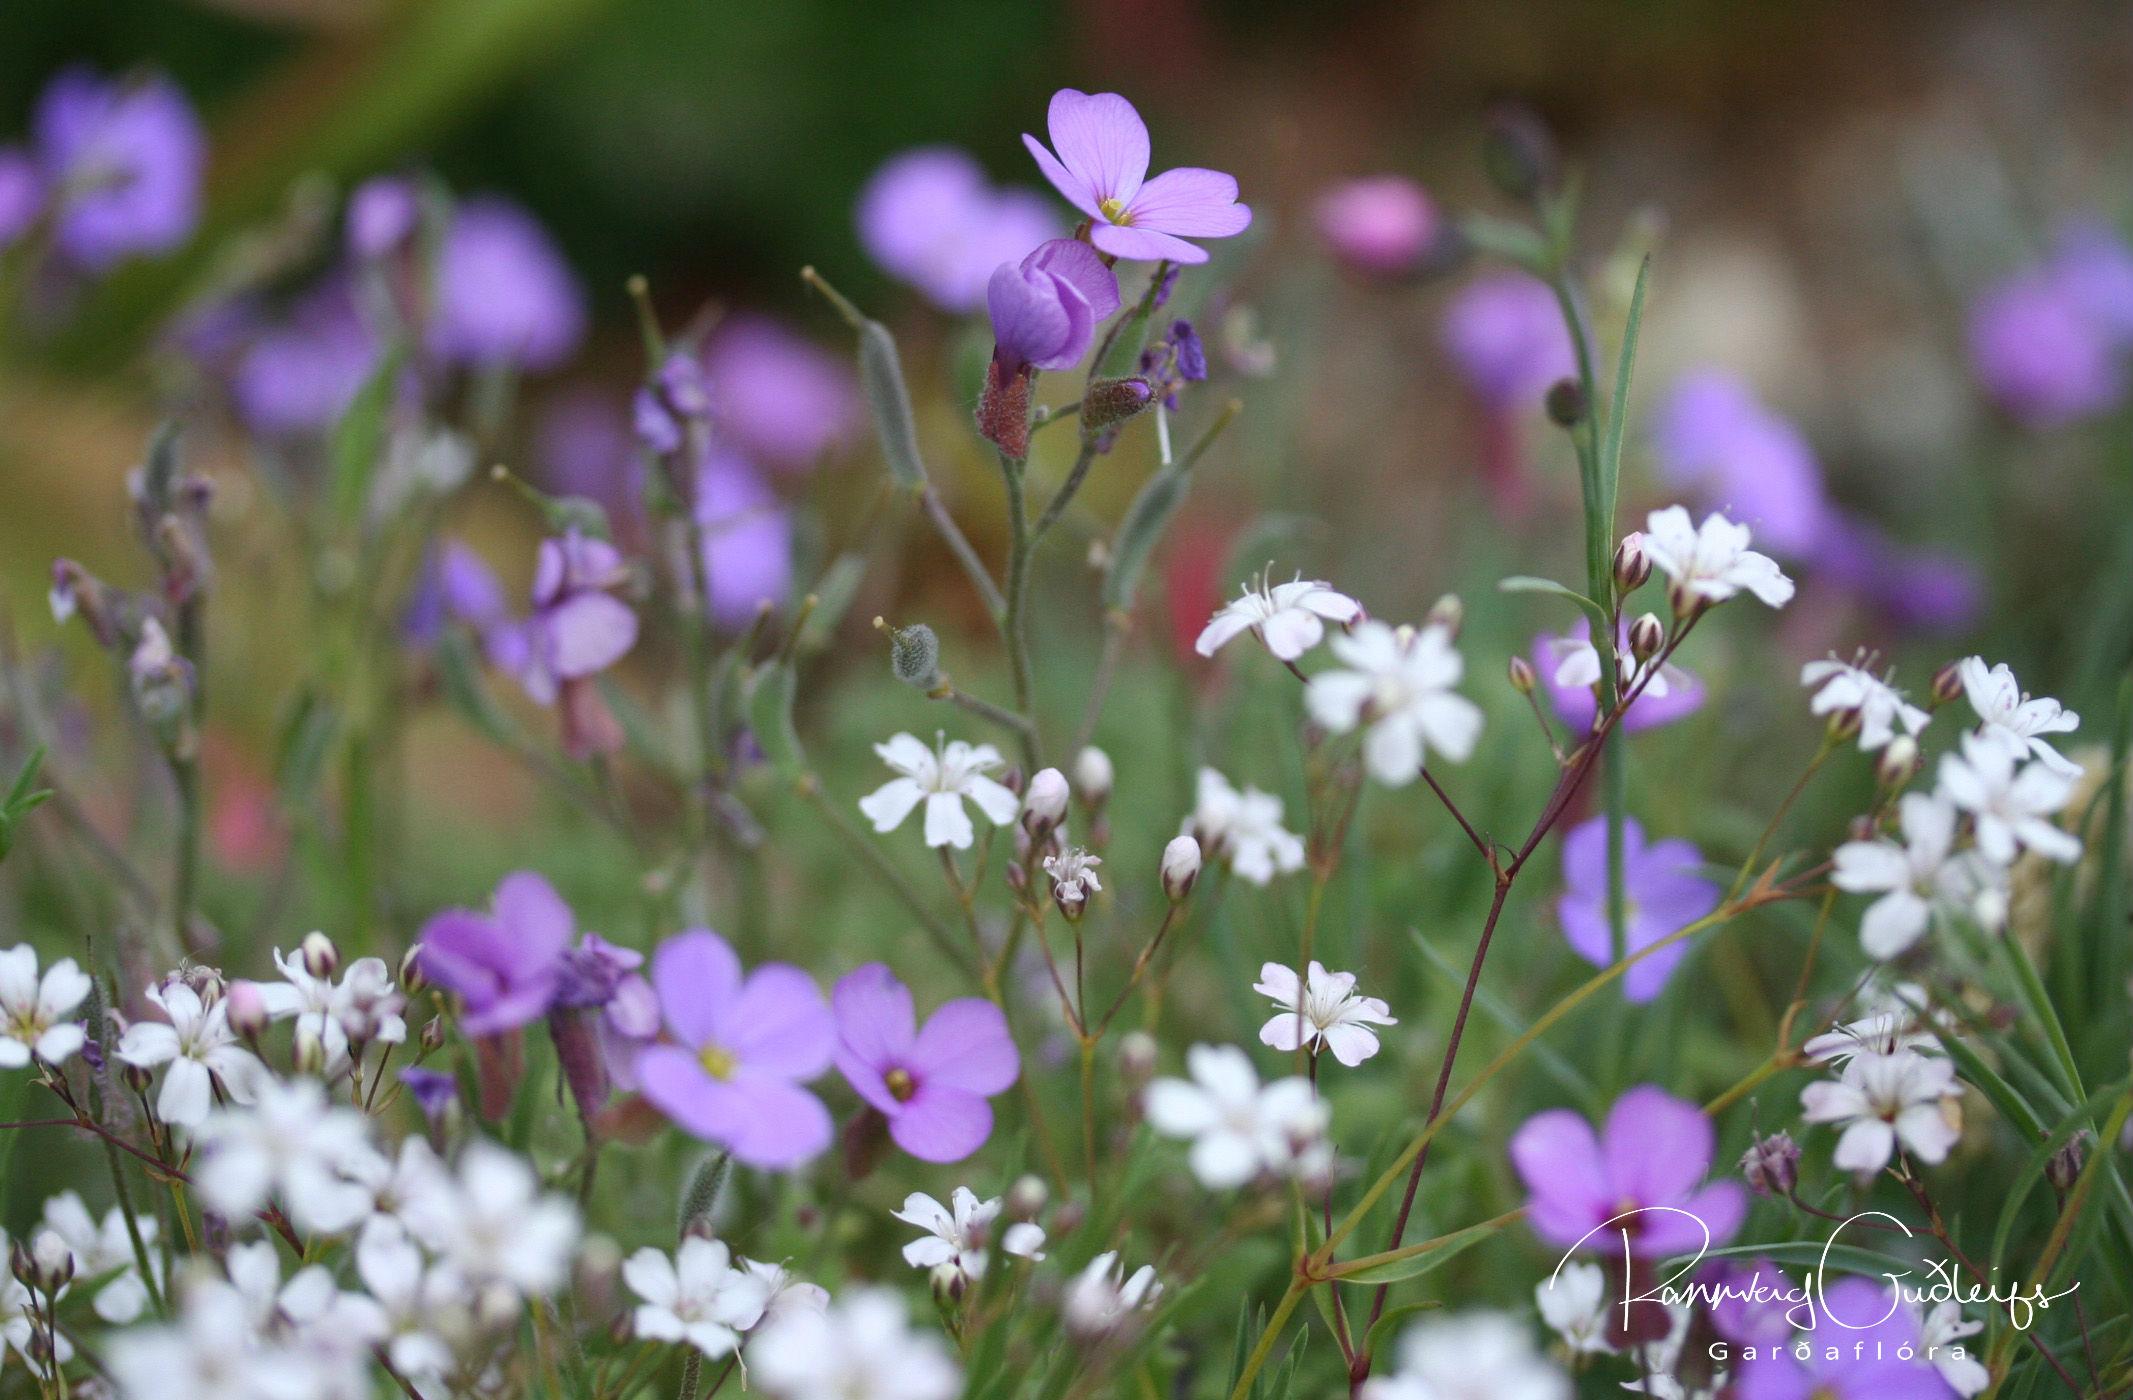 Aubrieta x cultorum 'Grandiflora'